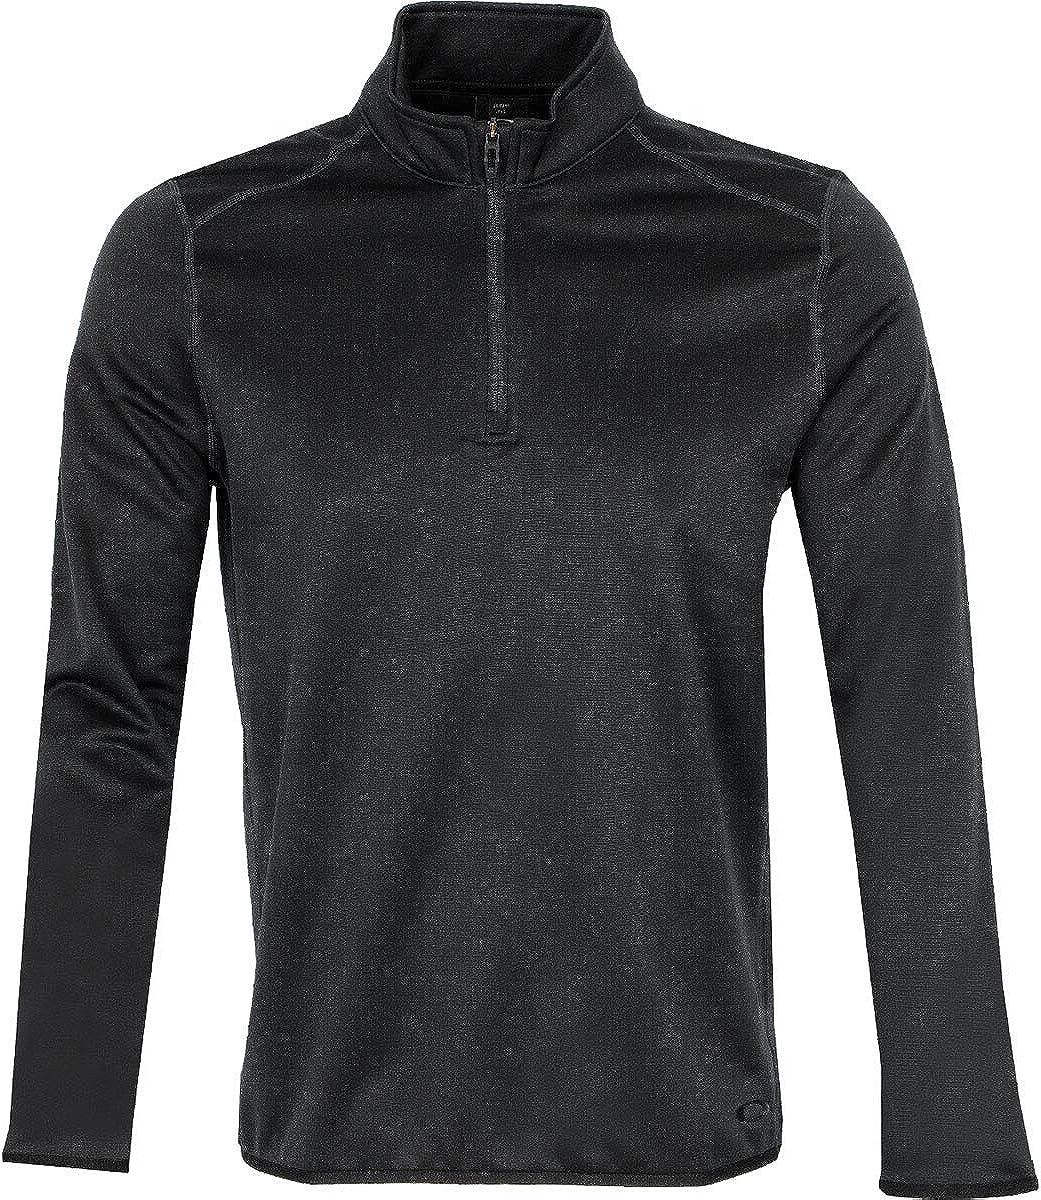 Oakley Men's Range 1/4 Zip Sweater